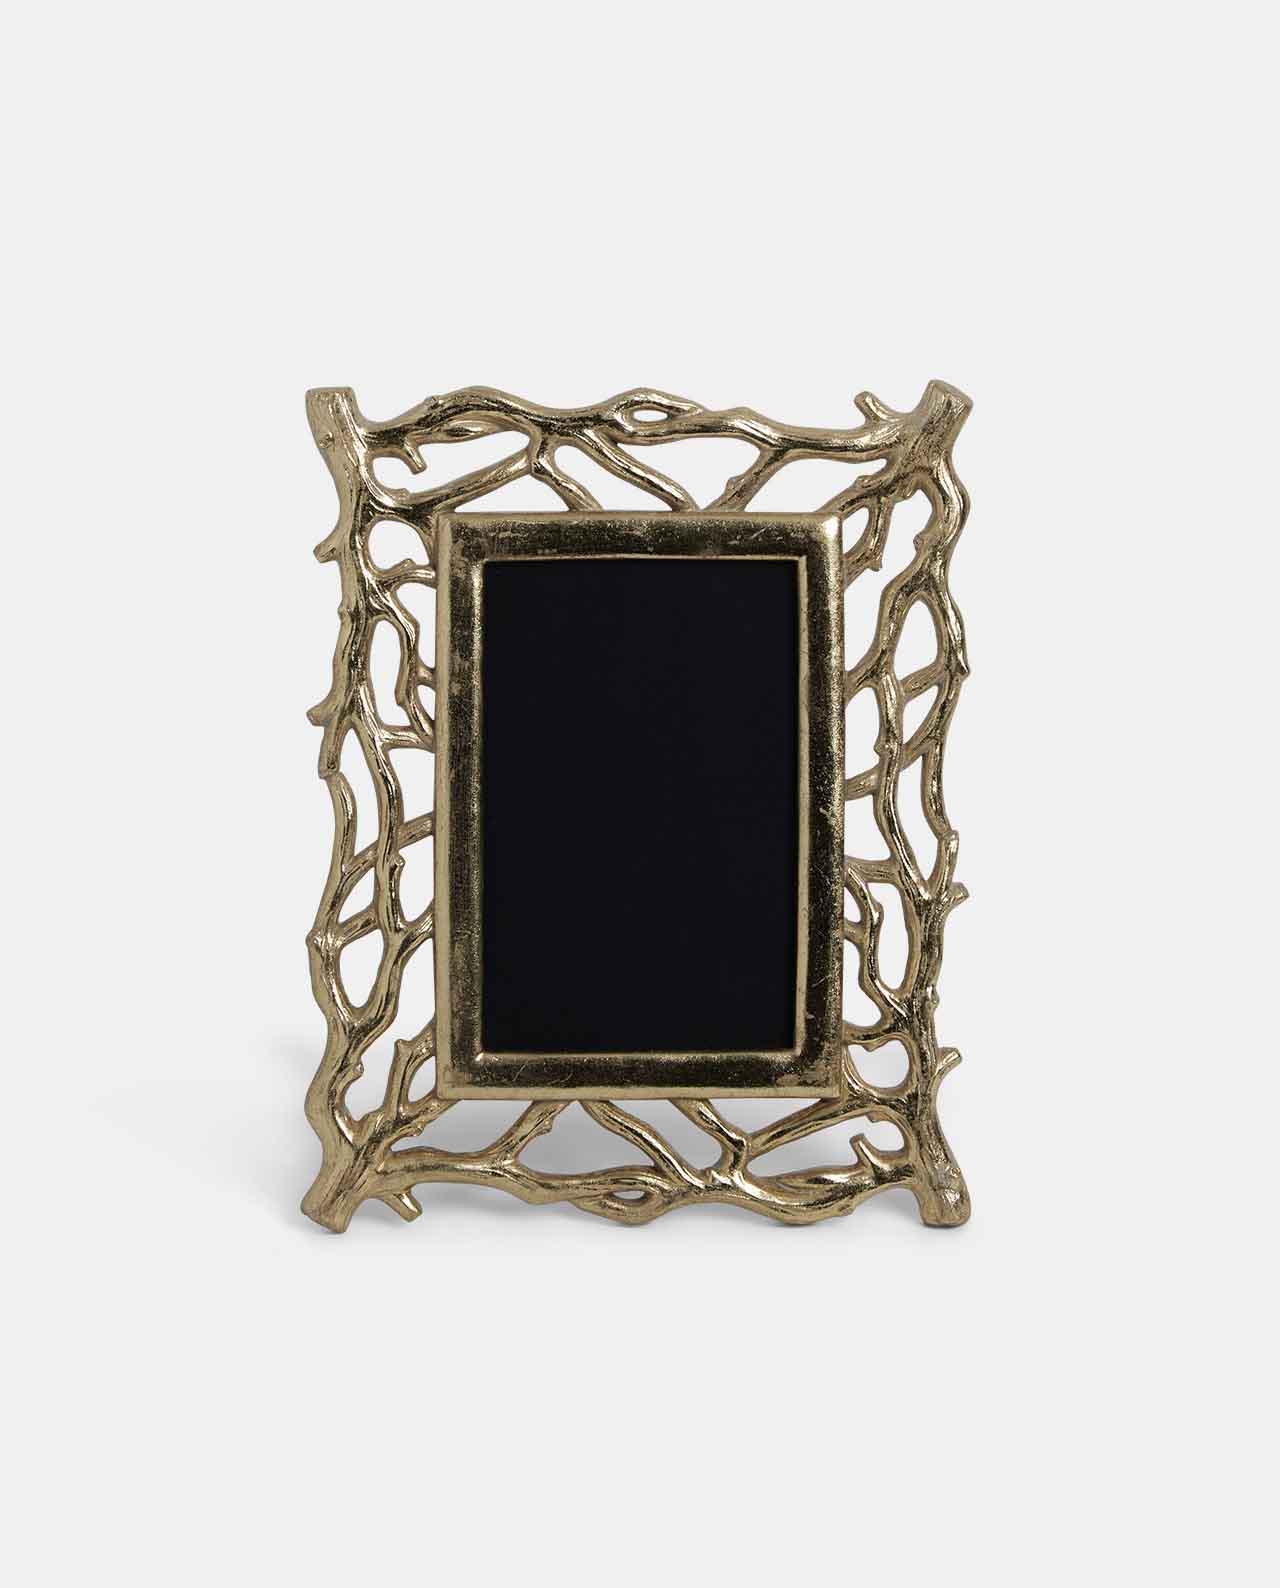 Small Gold Decoratorative Twig Photo Frame